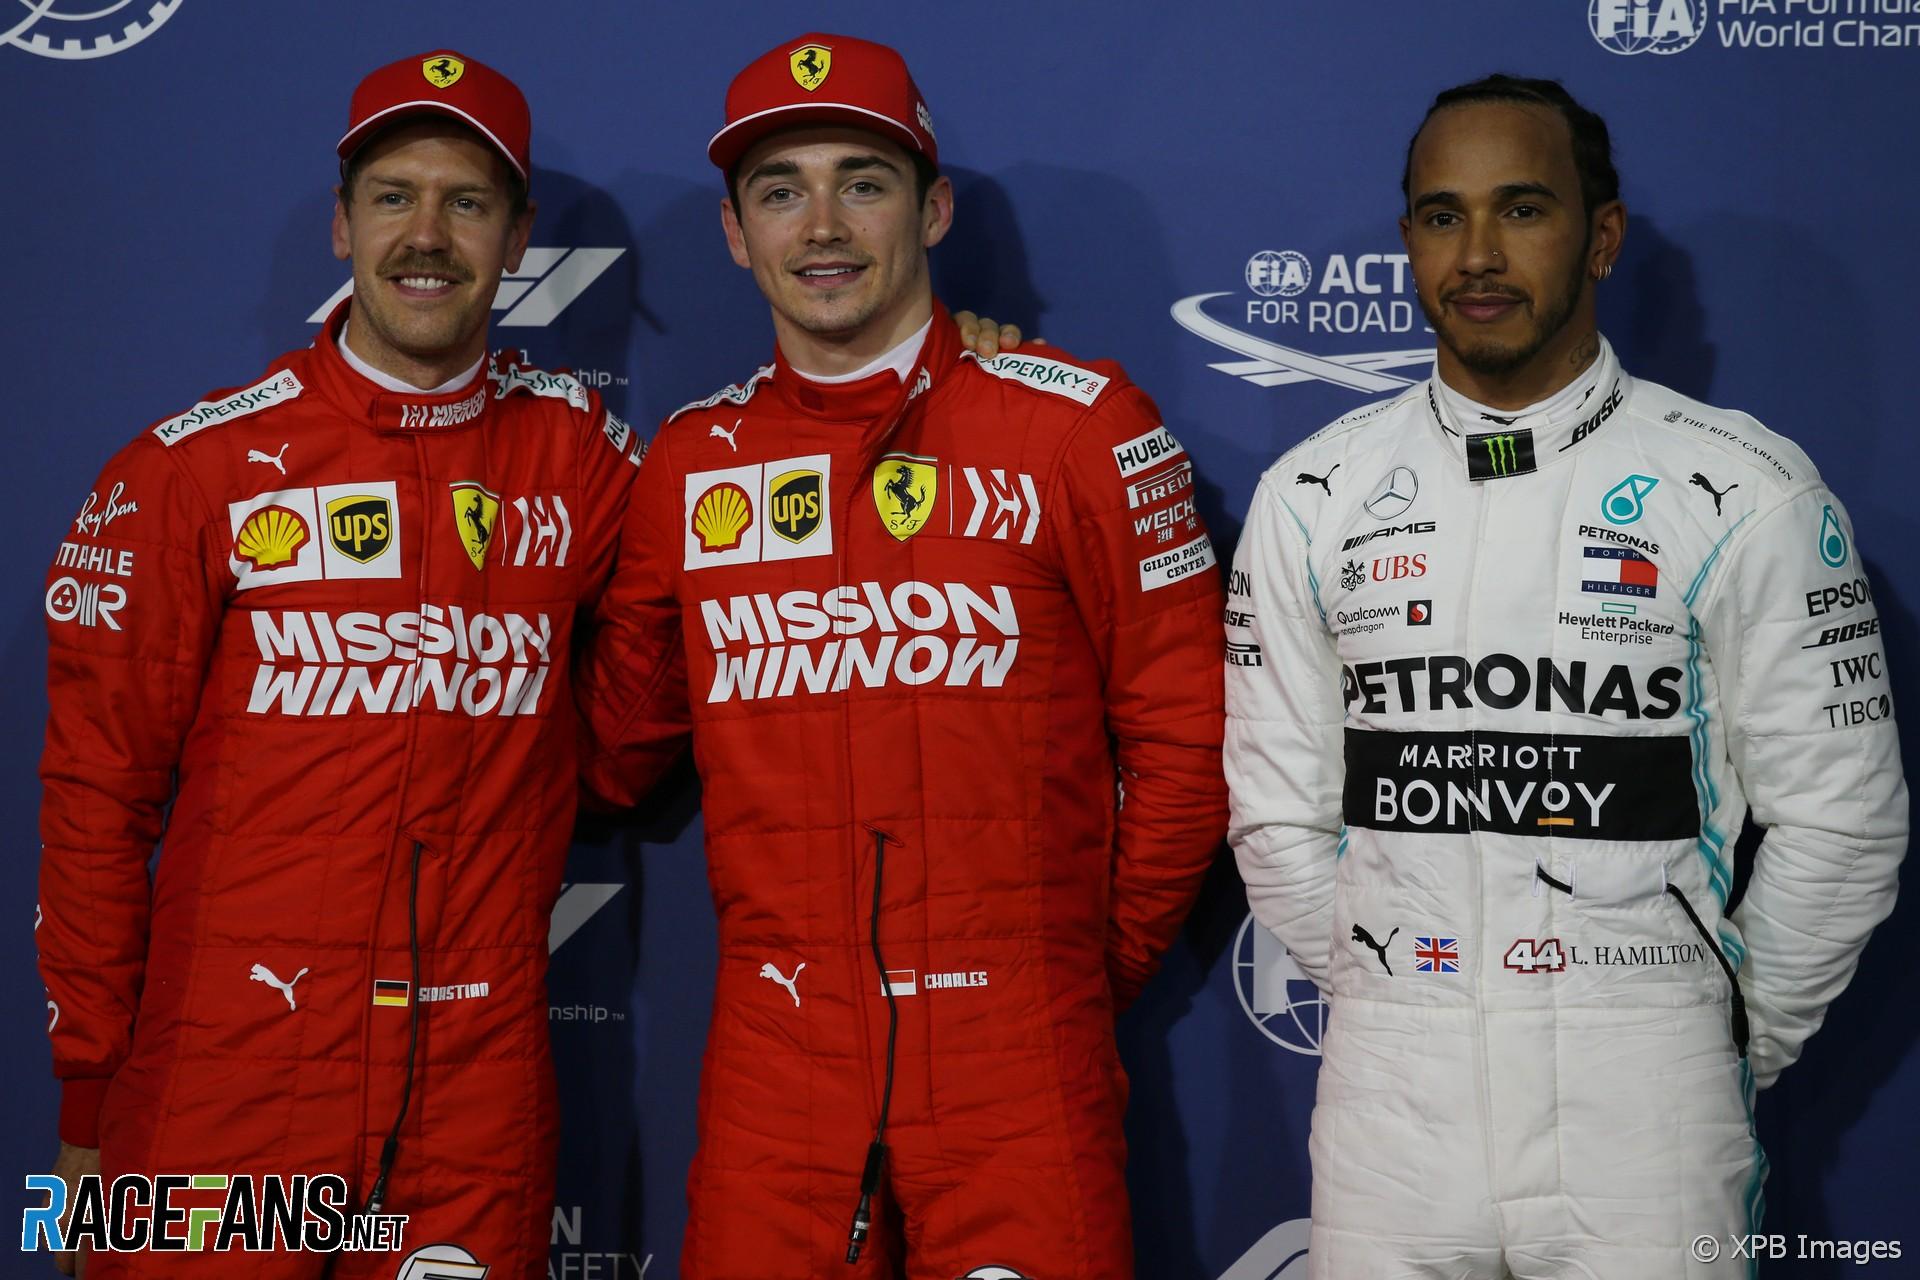 Charles Leclerc, Sebastian Vettel, Lewis Hamilton, Bahrain International Circuit, 2019